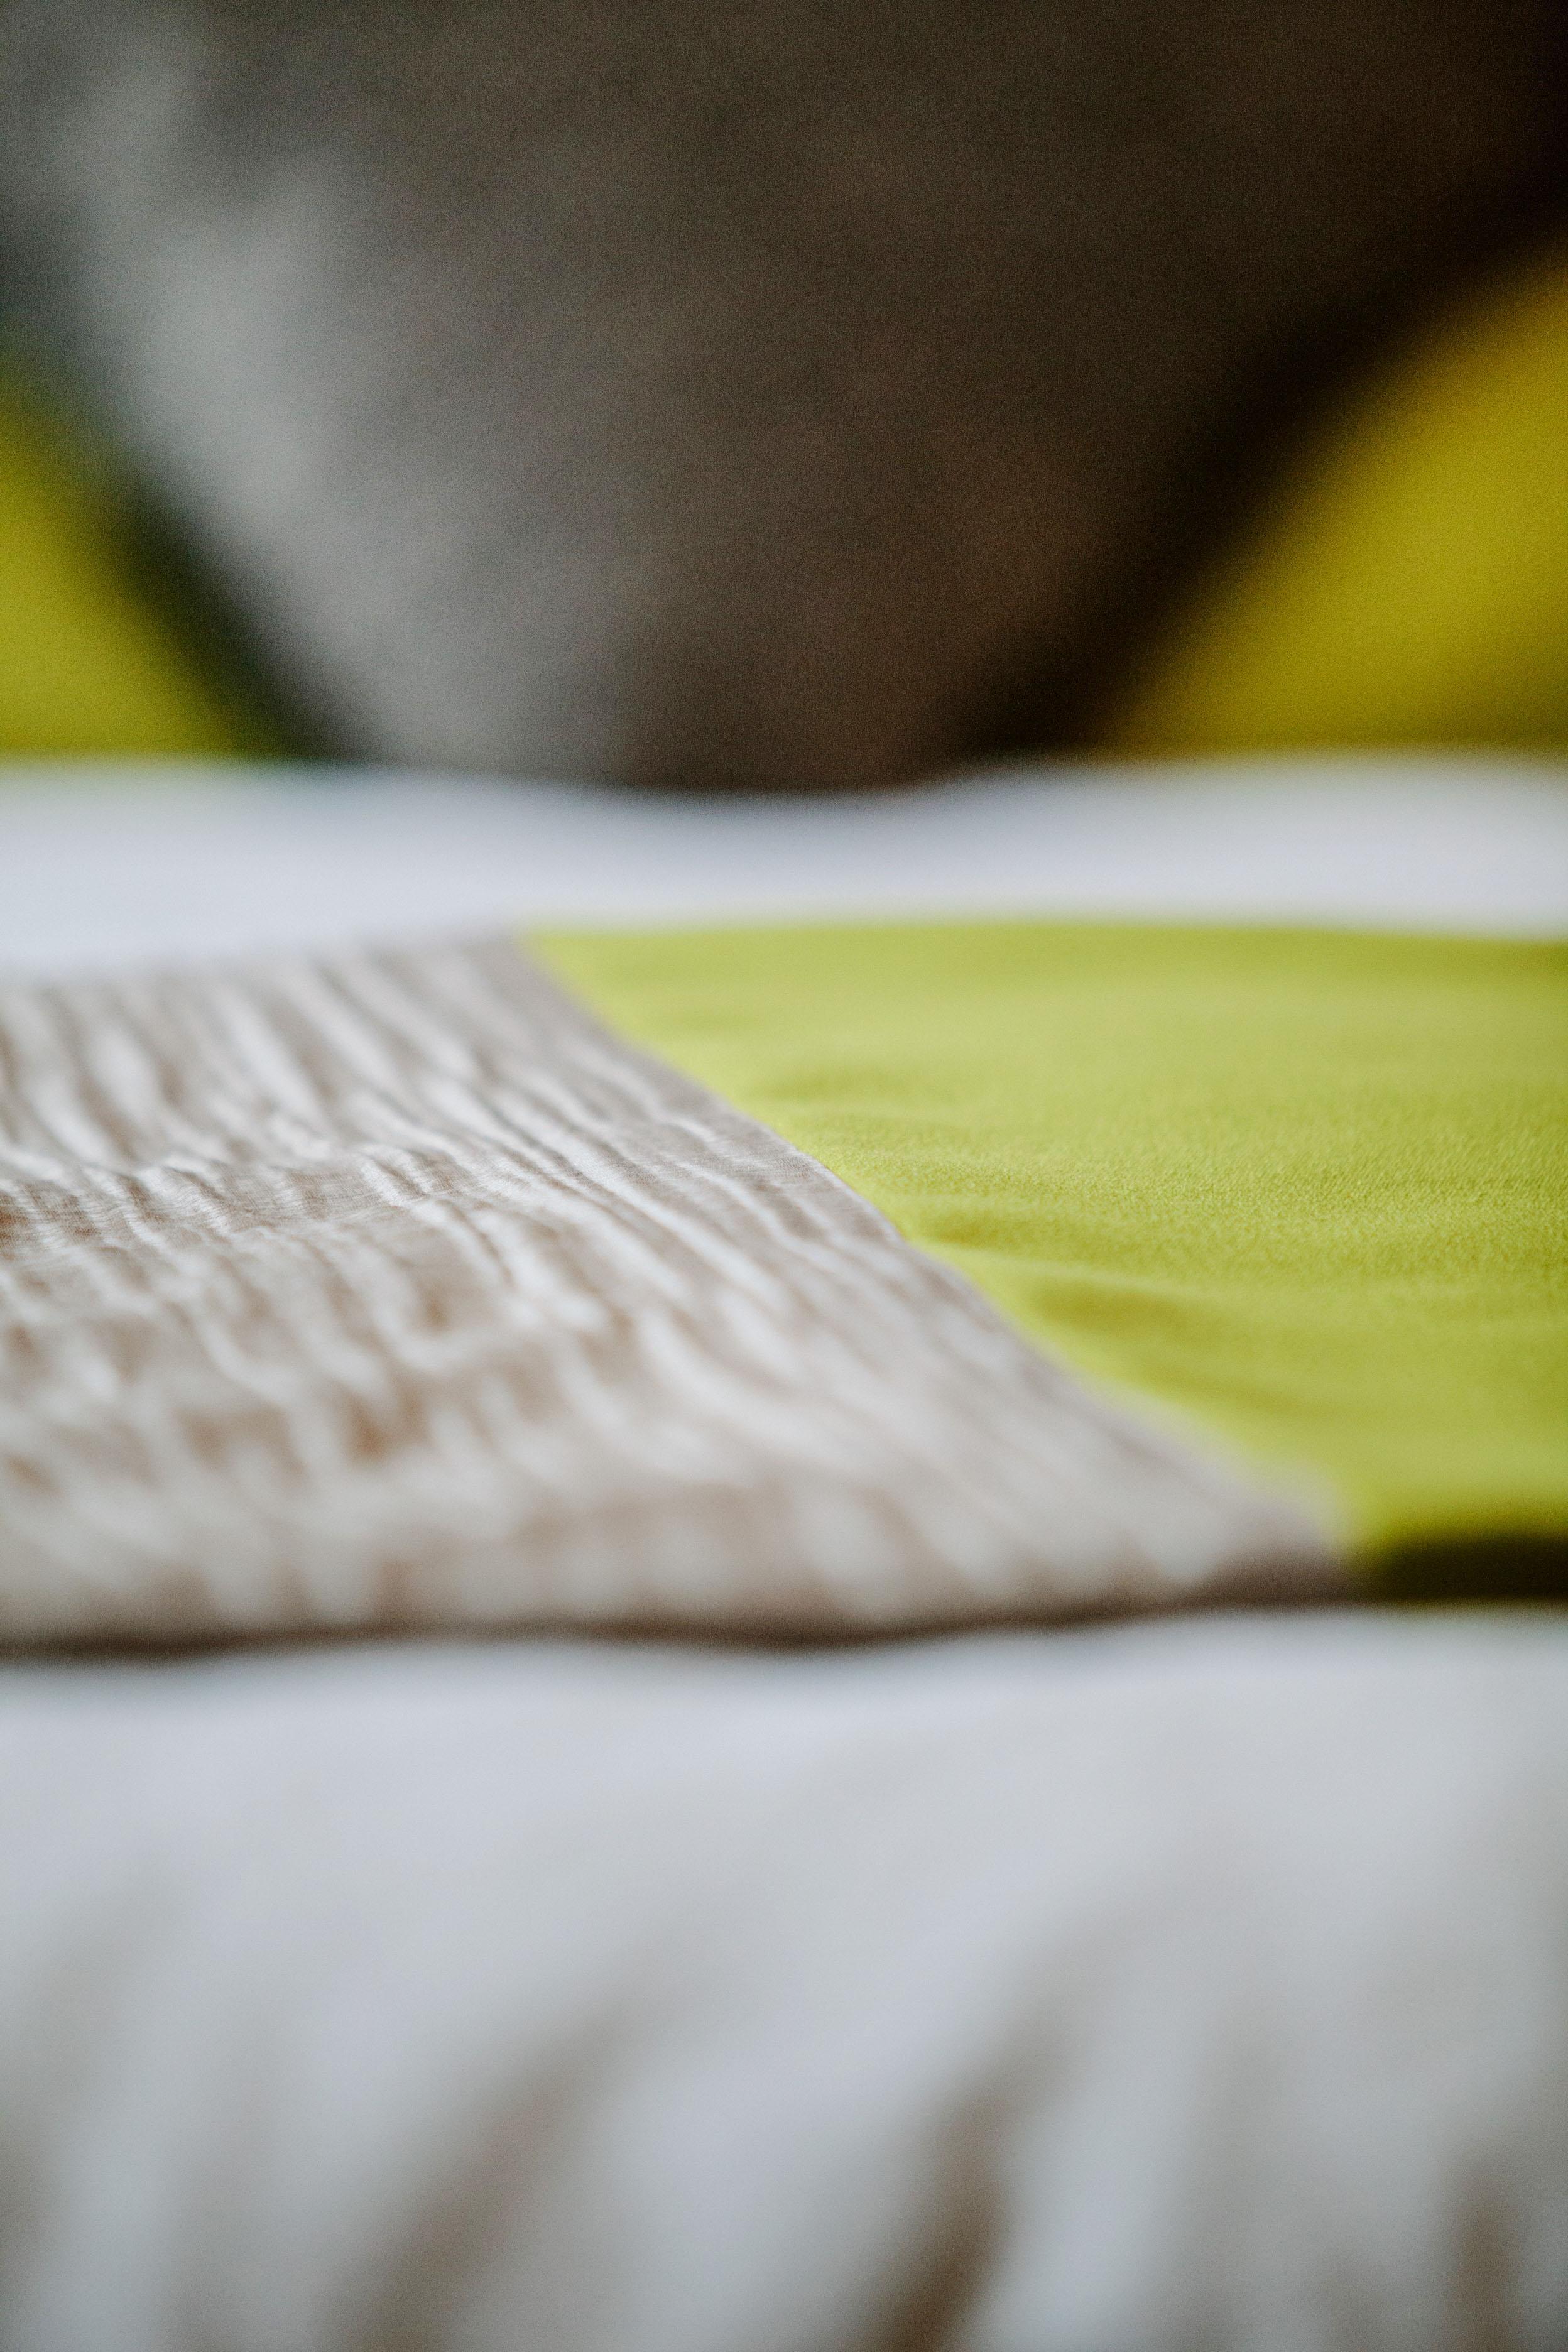 livingroom ideas, interior designer Oxfordshire, interior stylist, home decor, design ideas, turquoise and yellow, Buckingham, Berkshire, interior design psychology, interior designer UK, niki Schafer interior designer,